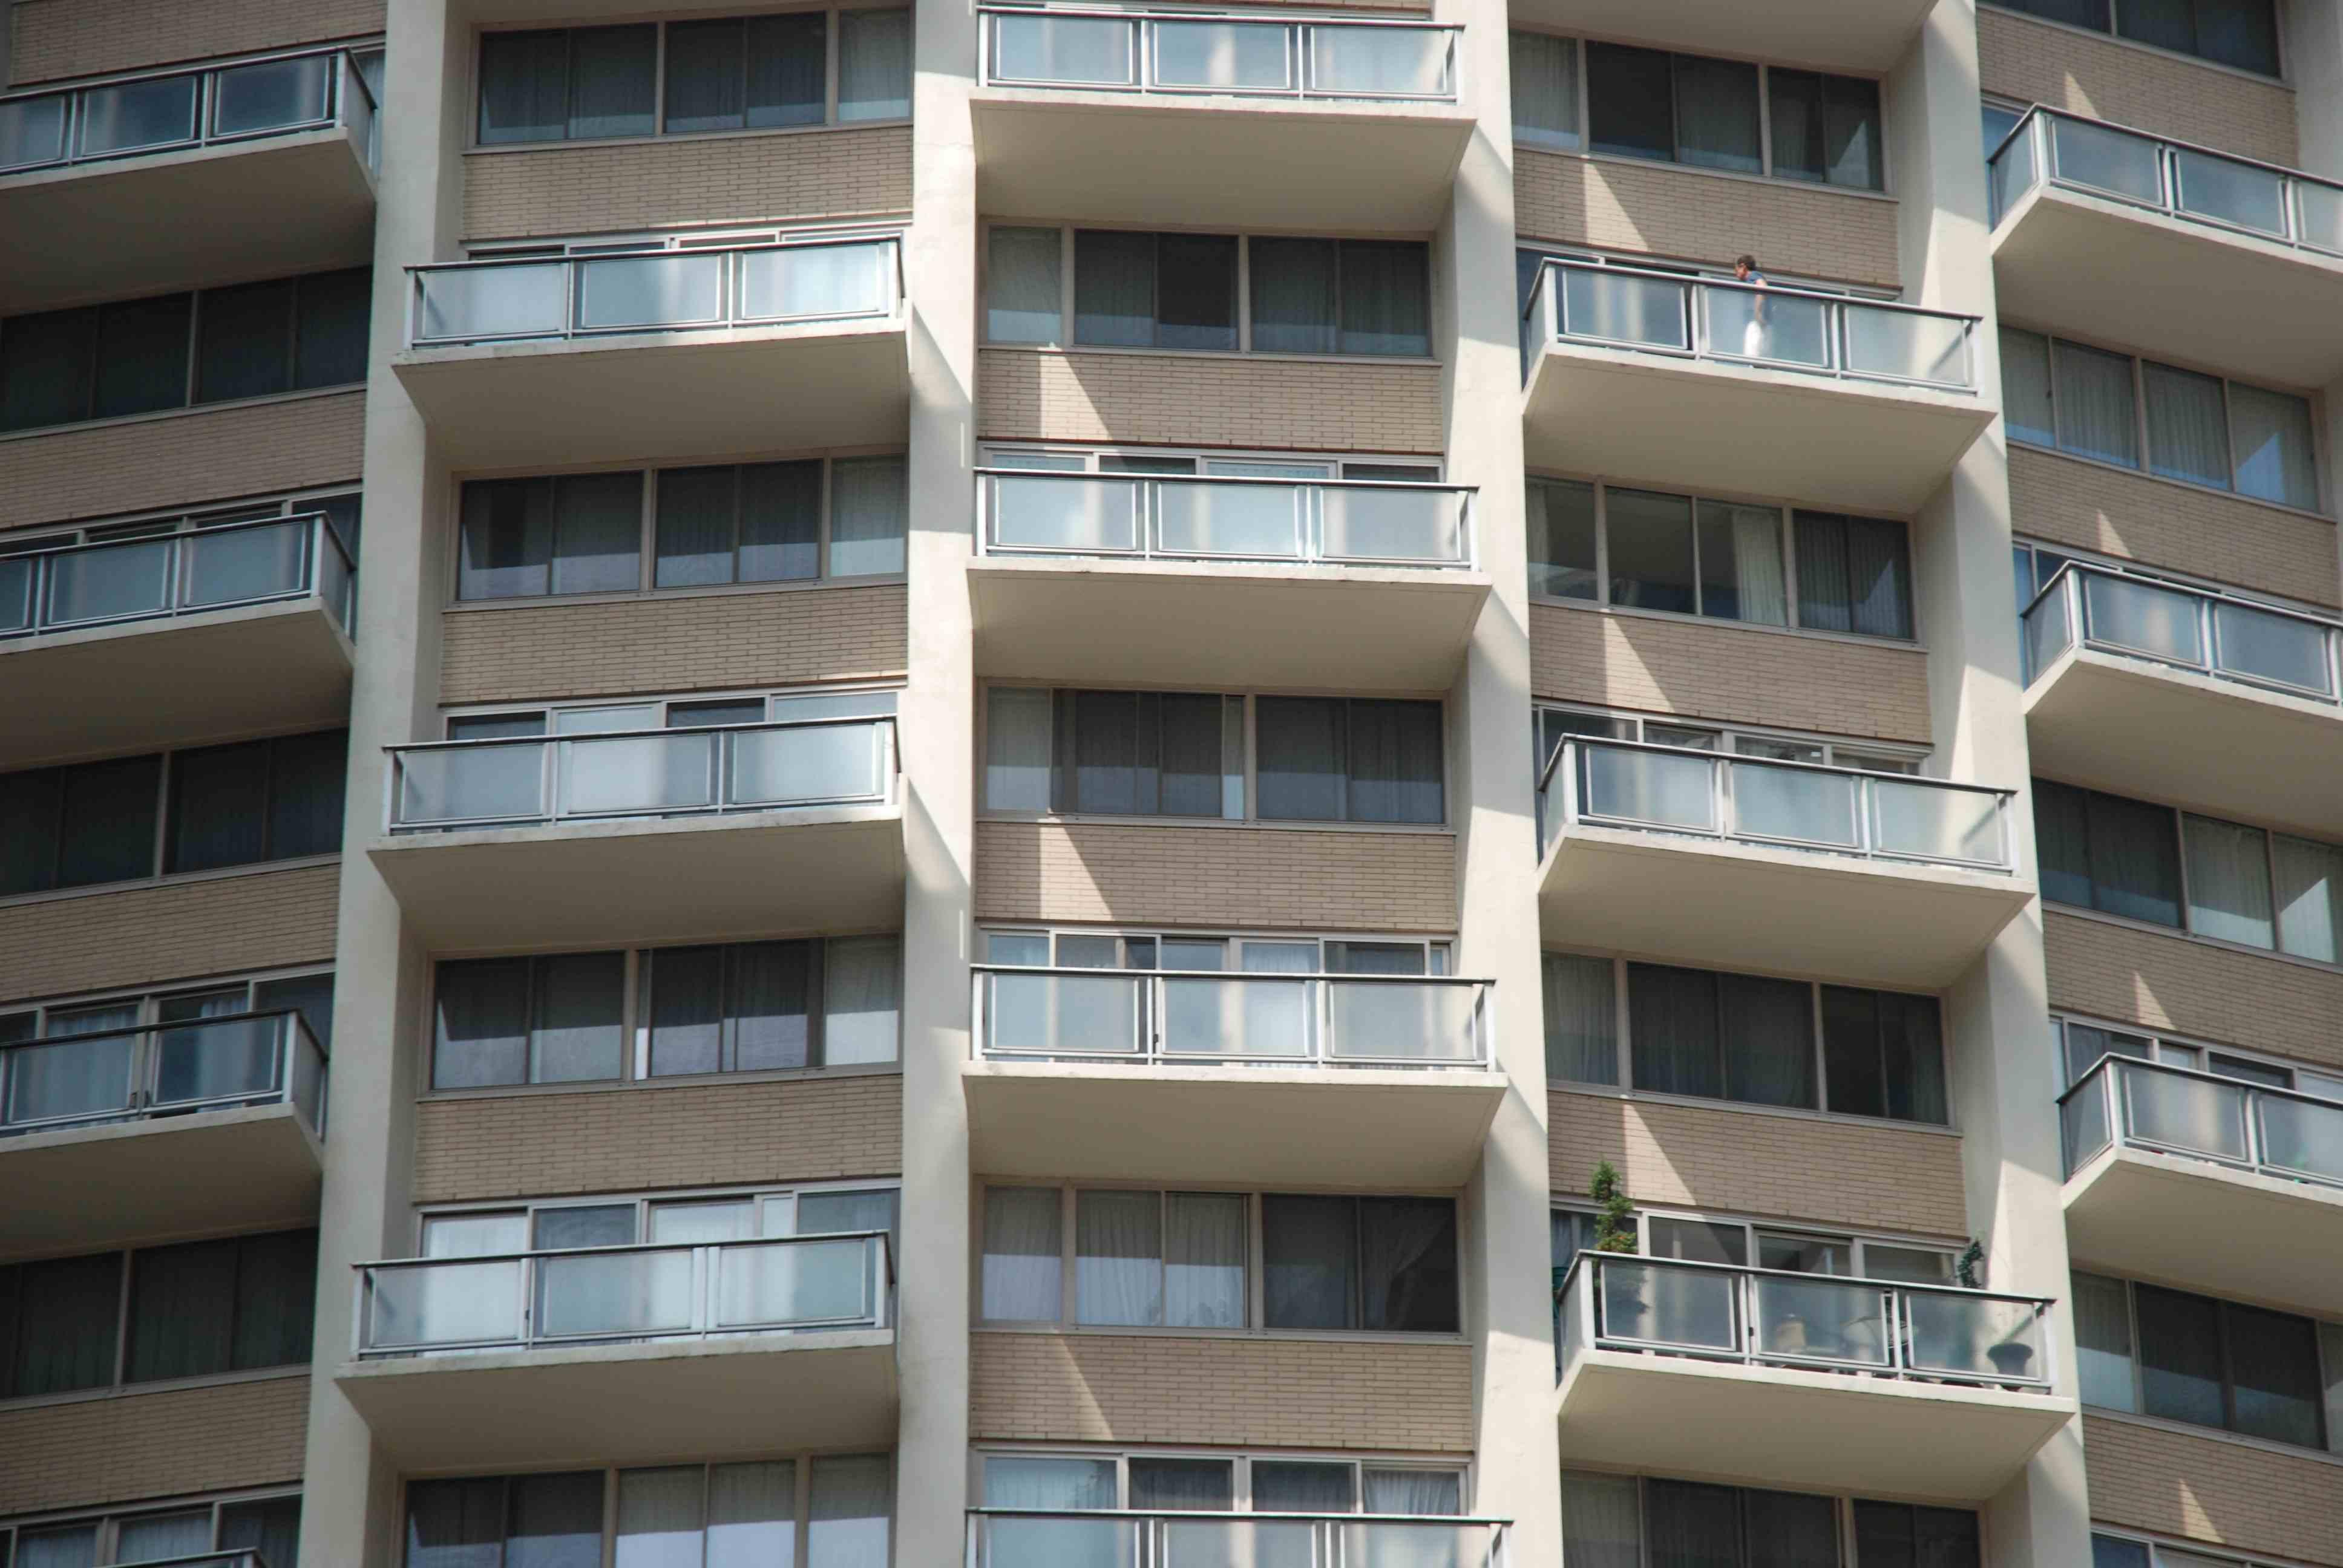 New york voyeur apartment window peep part 2 7